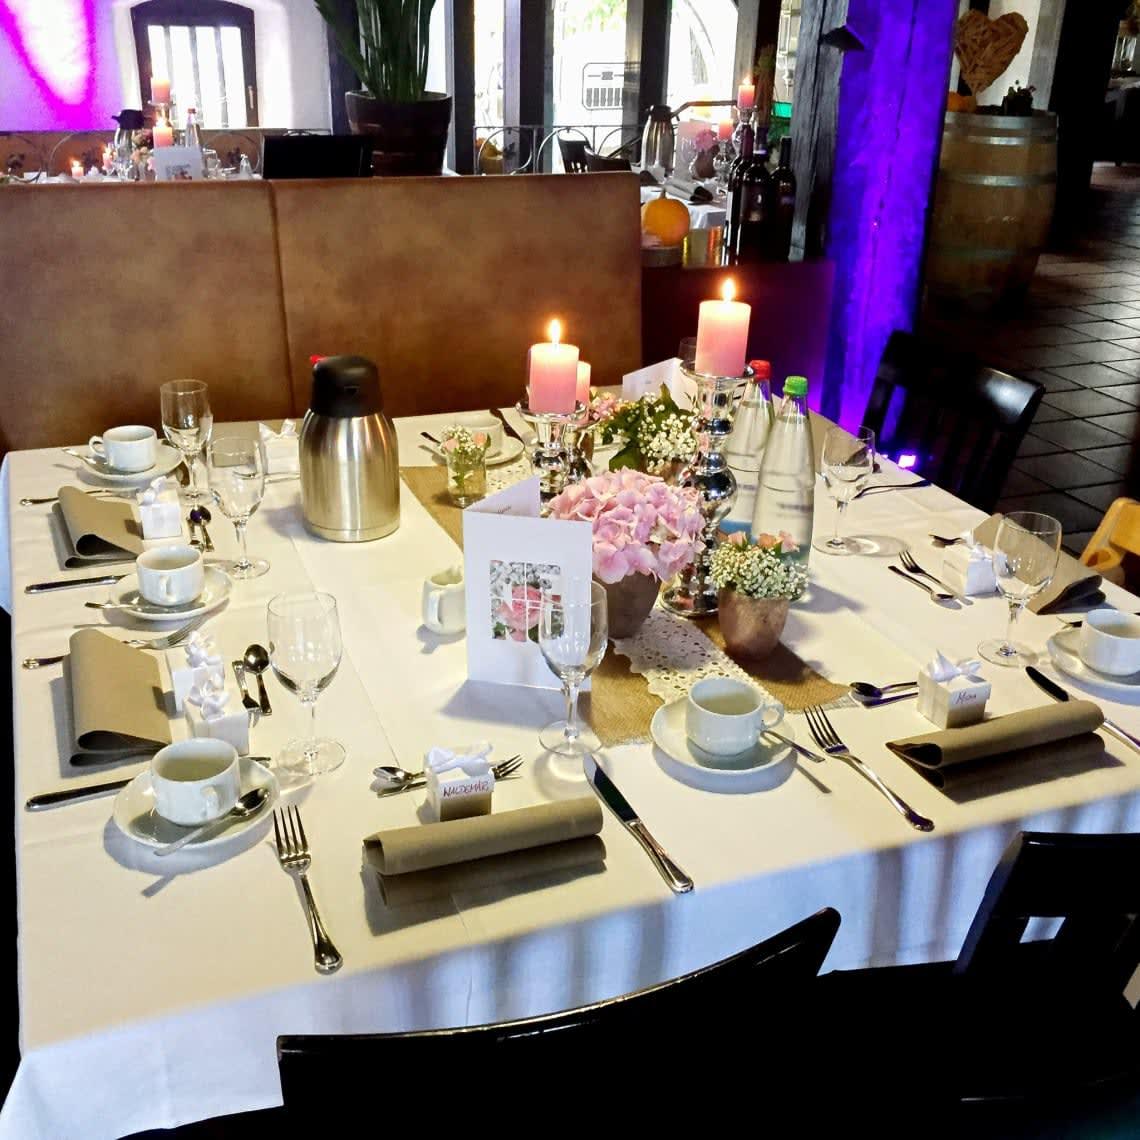 Alte Kelter Quadratischer Tisch mit Kerze